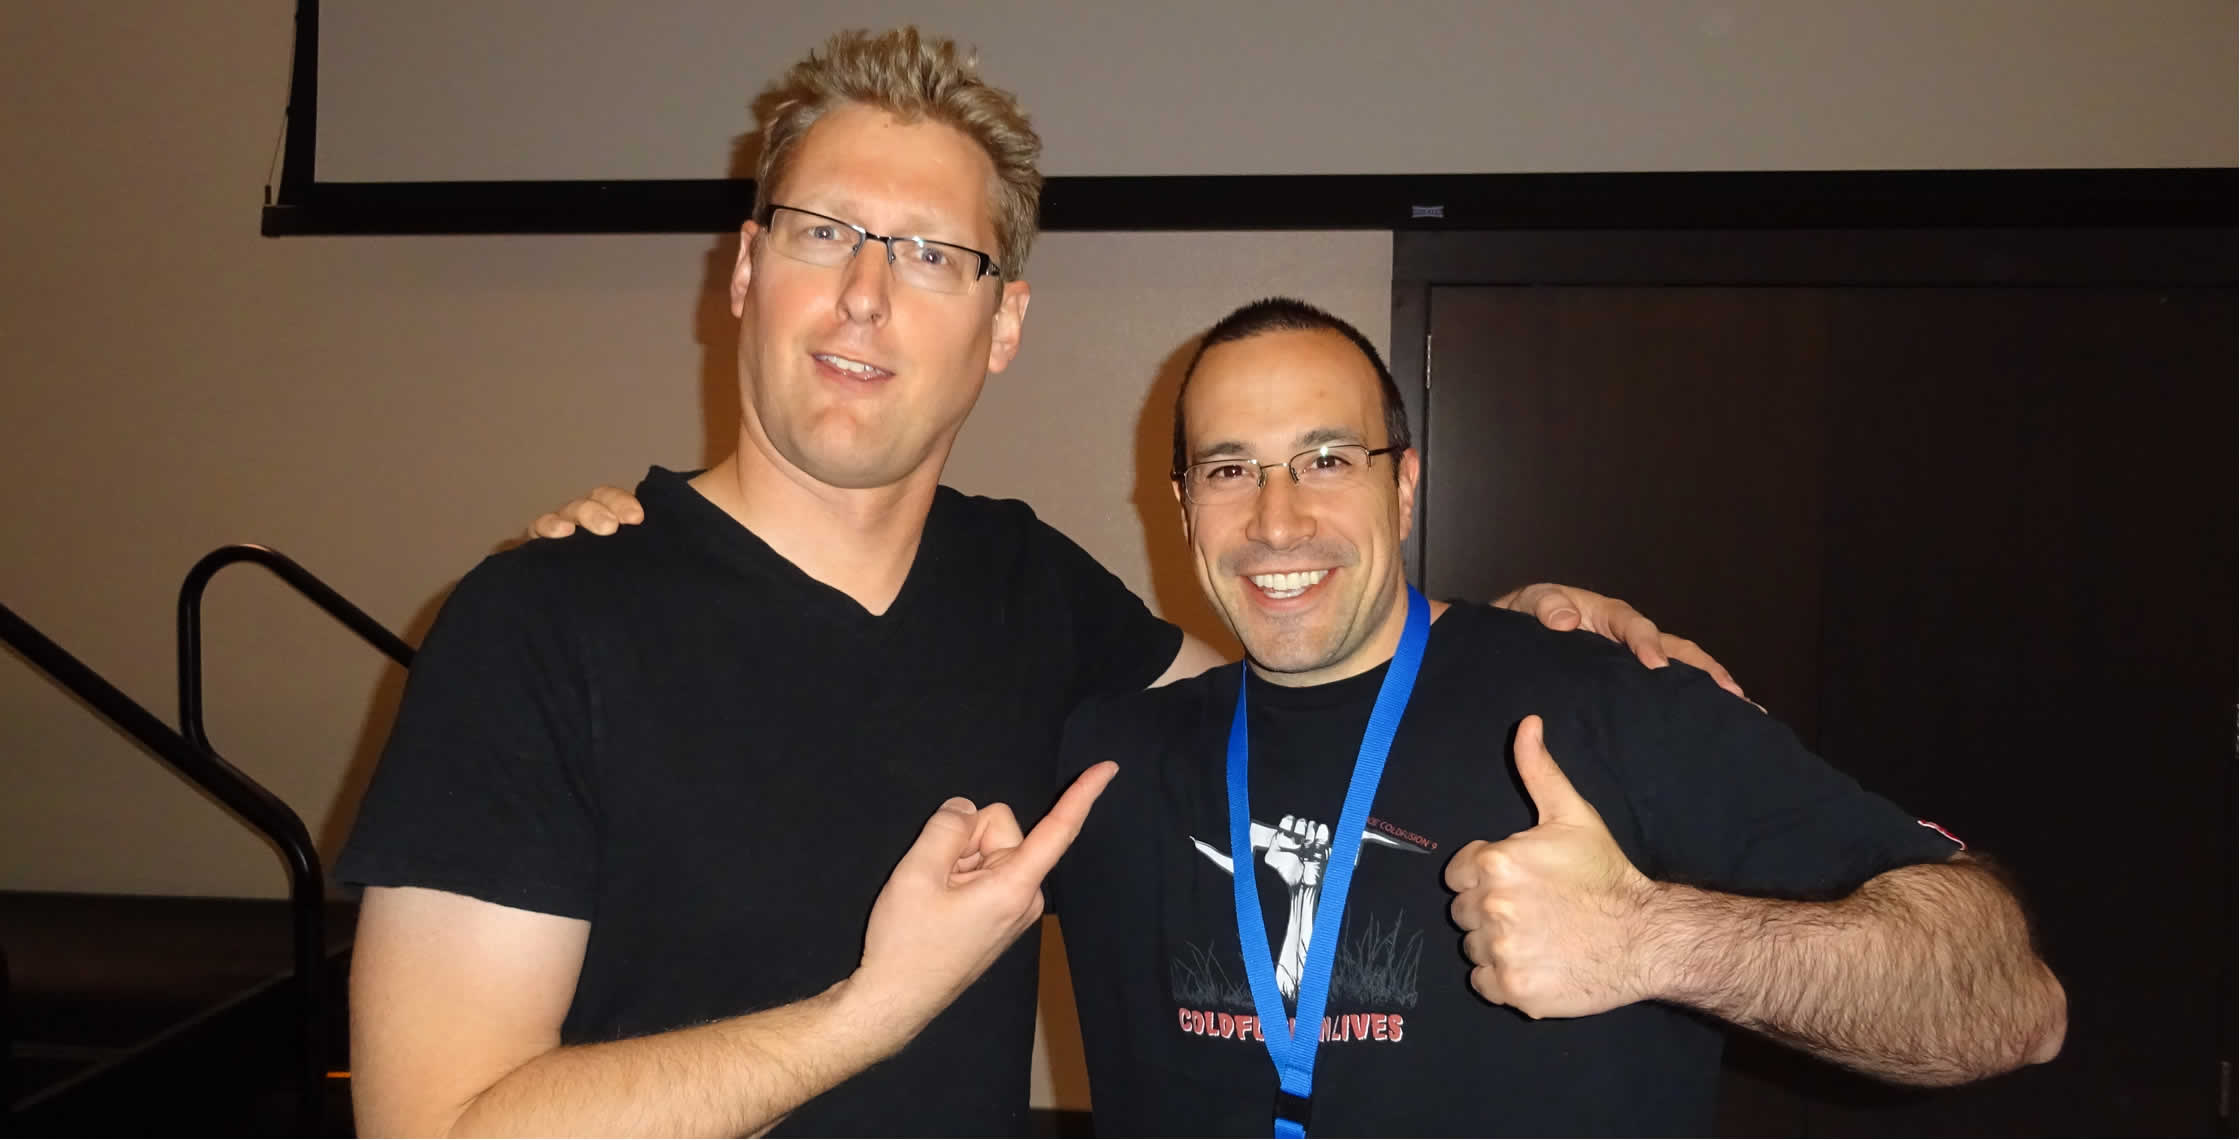 Ben Nadel at cf.Objective() 2014 (Bloomington, MN) with: Matthew Reinbold